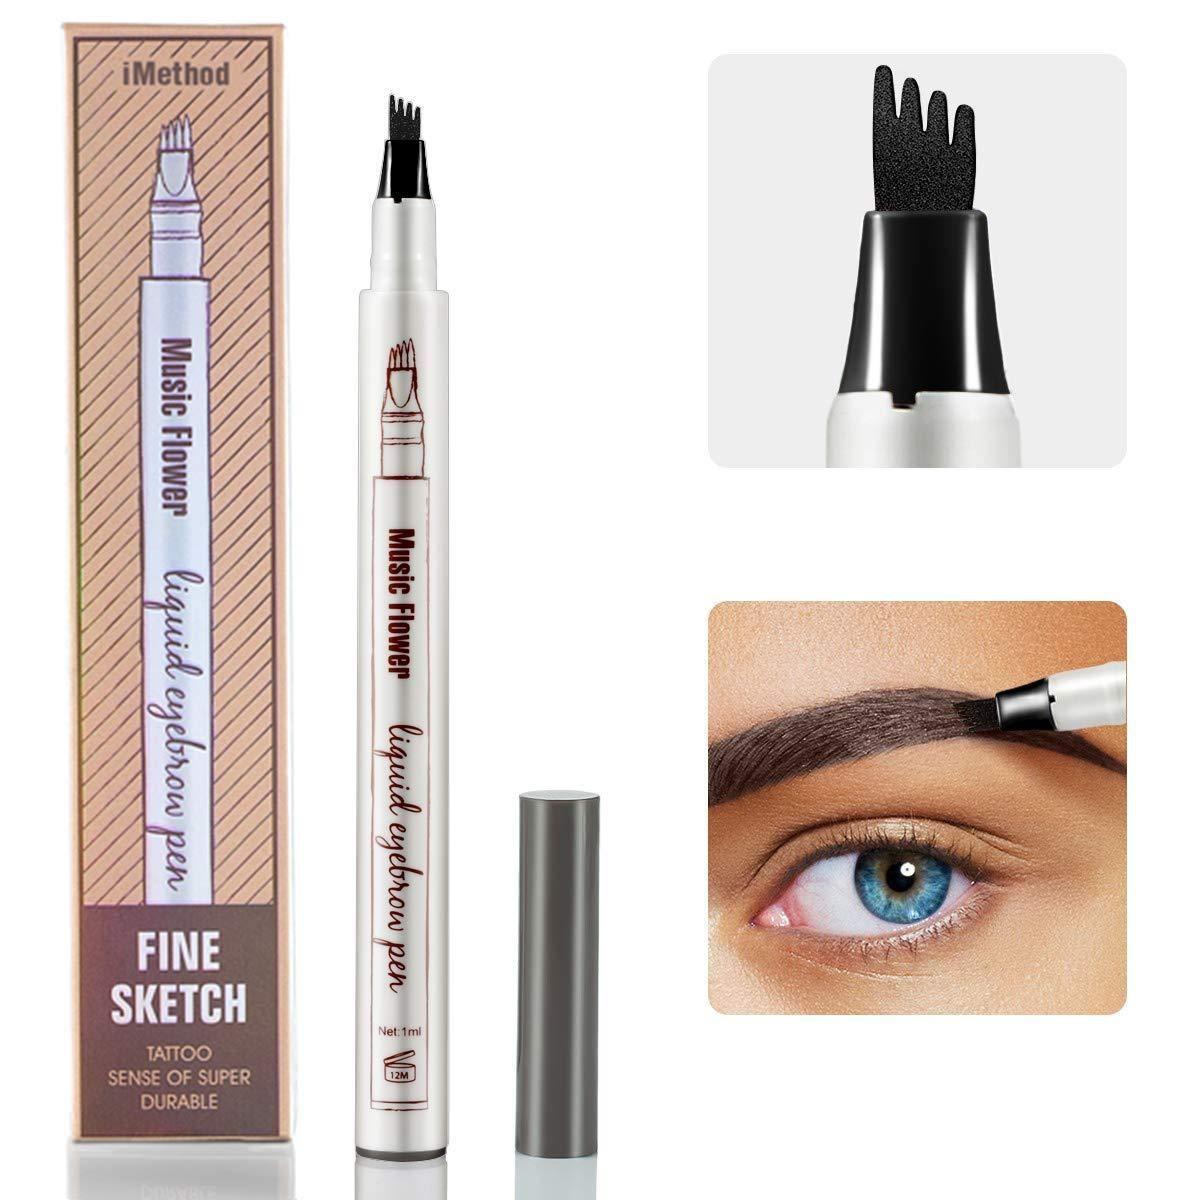 Eyebrow Tattoo Pen iMethod Microblading Eyebrow Pencil